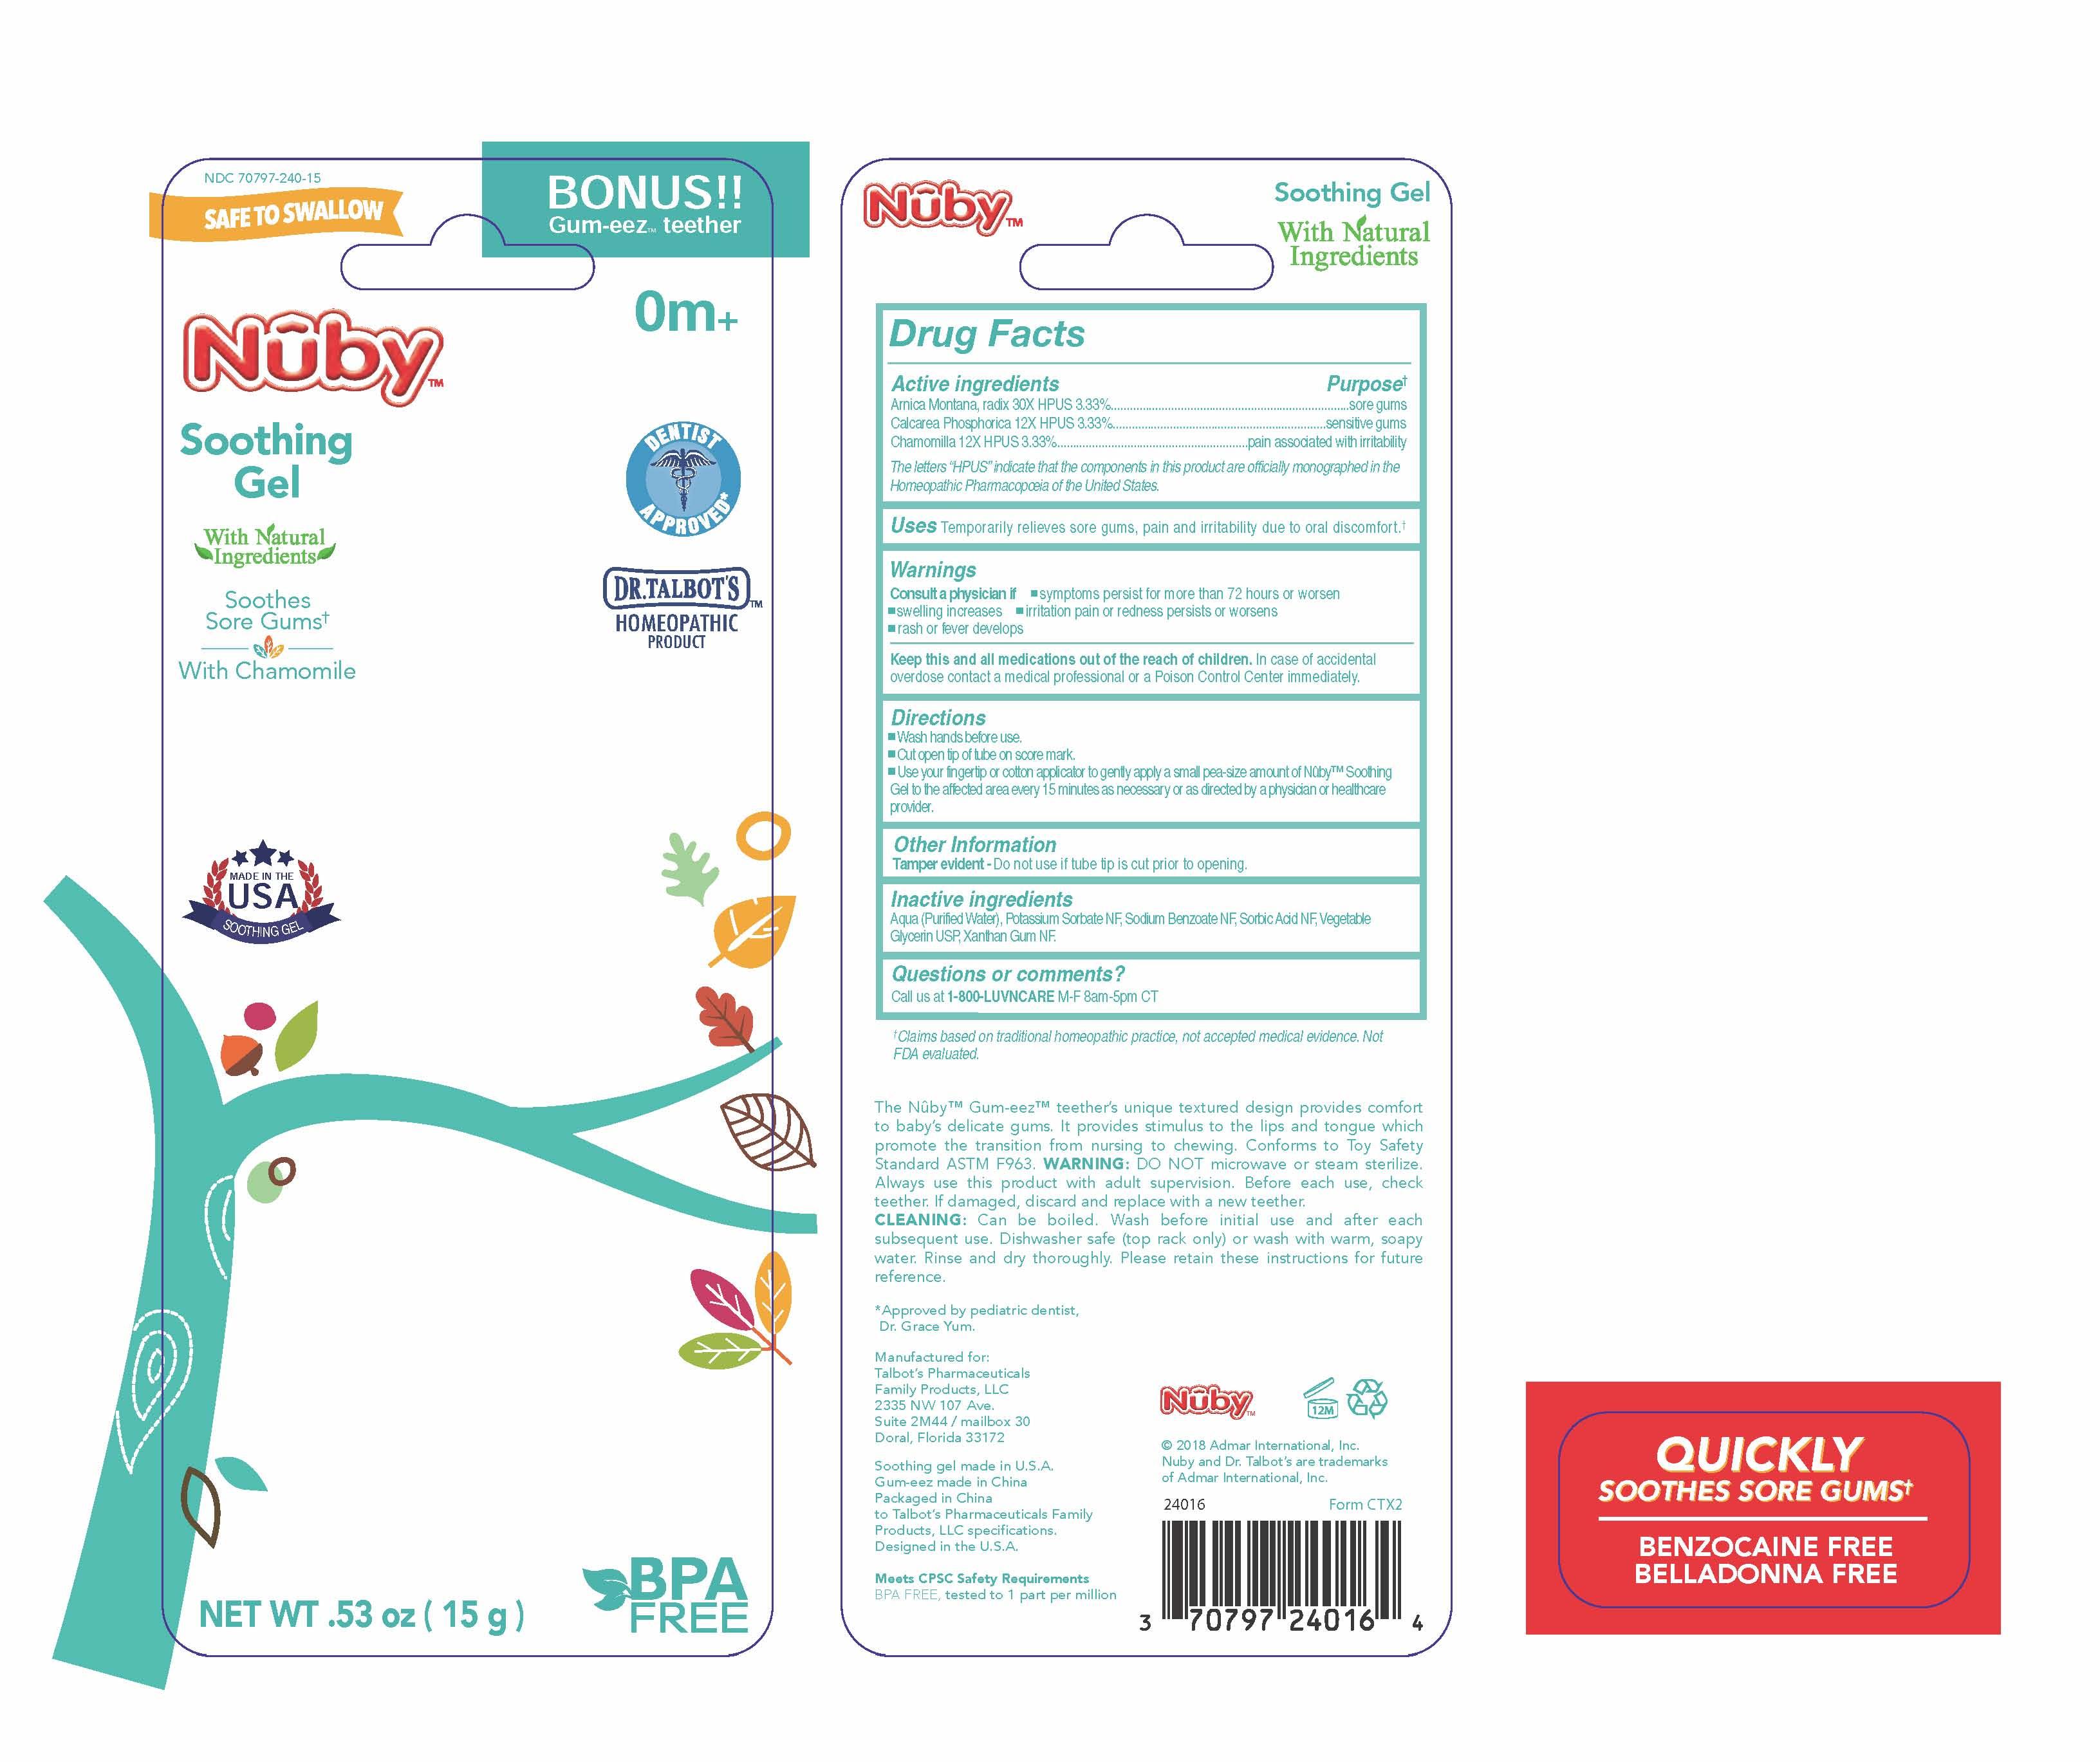 Nuby Soothing Gel   Matricaria Recutita 12 [hp_x], Arnica Montana Root 30 [hp_x], Calcium Cation 12 [hp_x] and breastfeeding